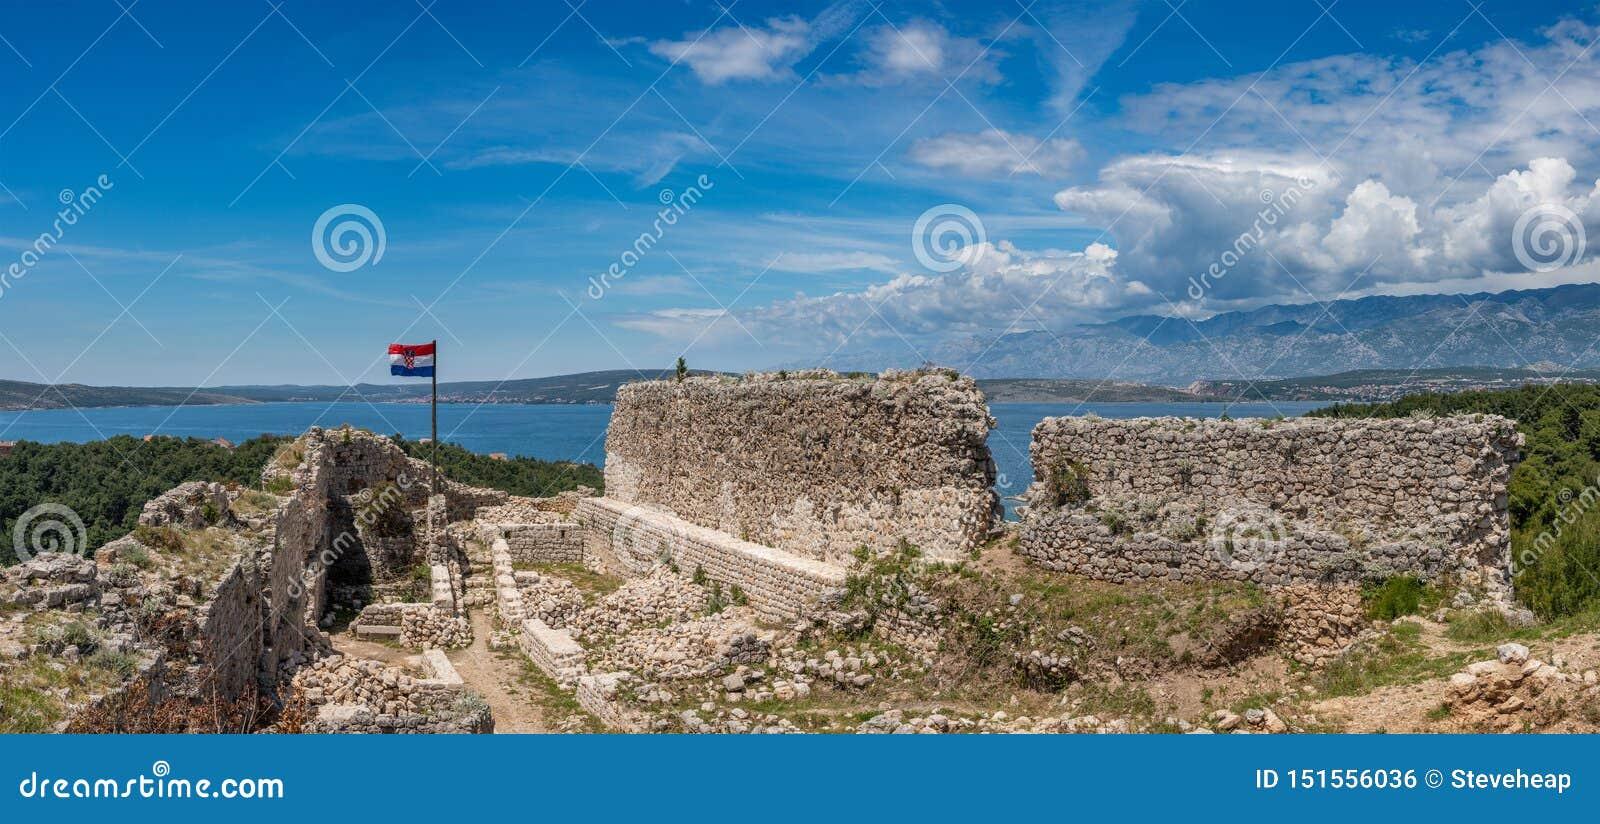 Bandeira sobre a fortaleza acima da cidade croata de Novigrad no condado de Istria